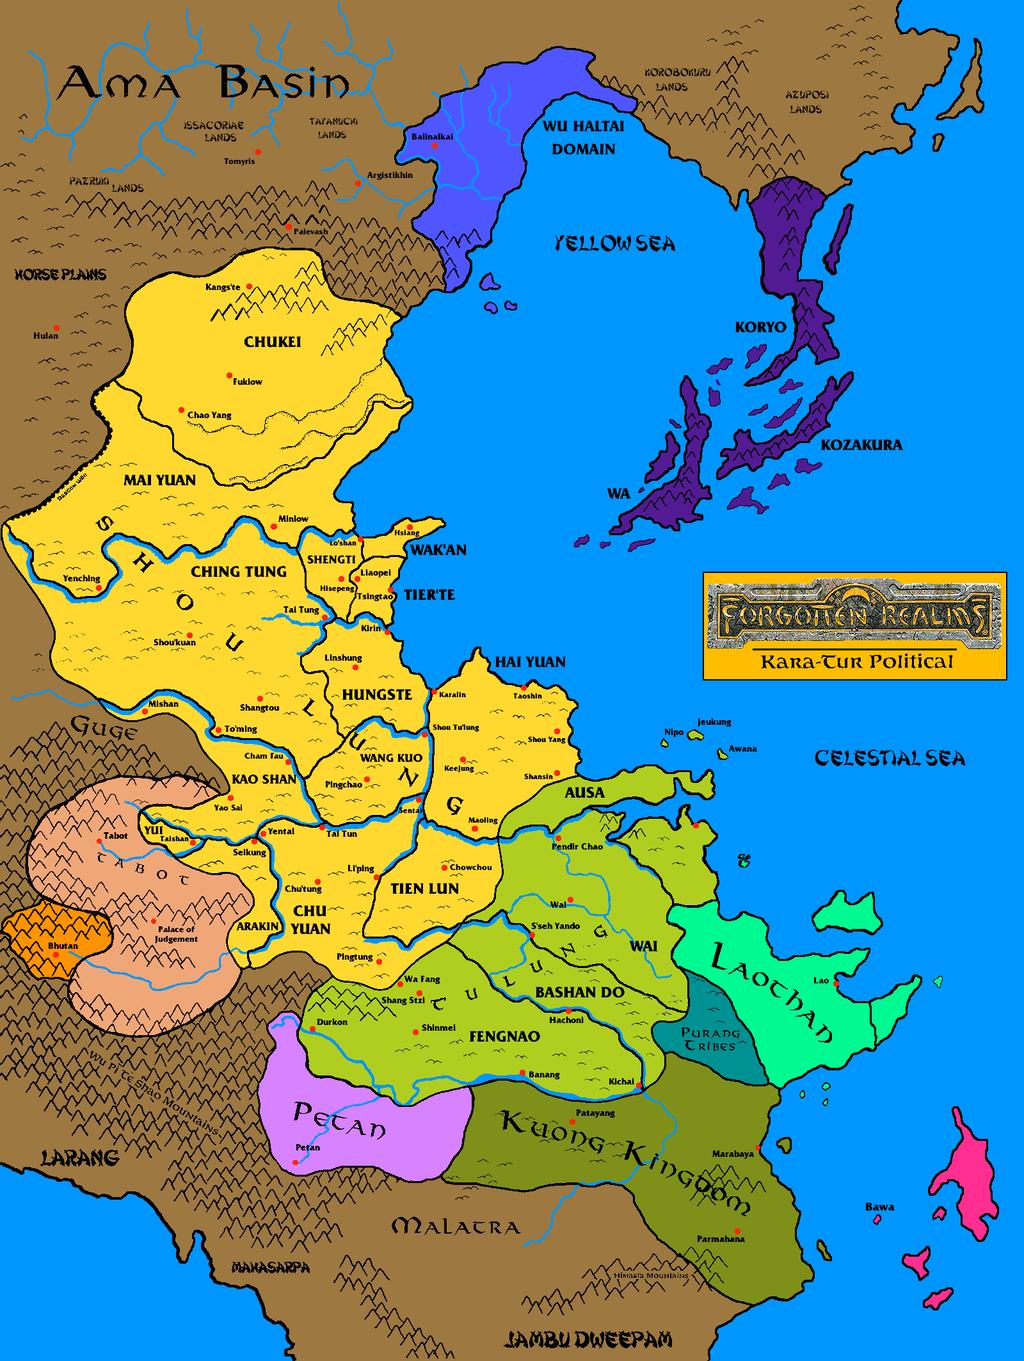 Kara-Tur geopolitical by Grimklok in 2020 | Fantasy map, Map ...